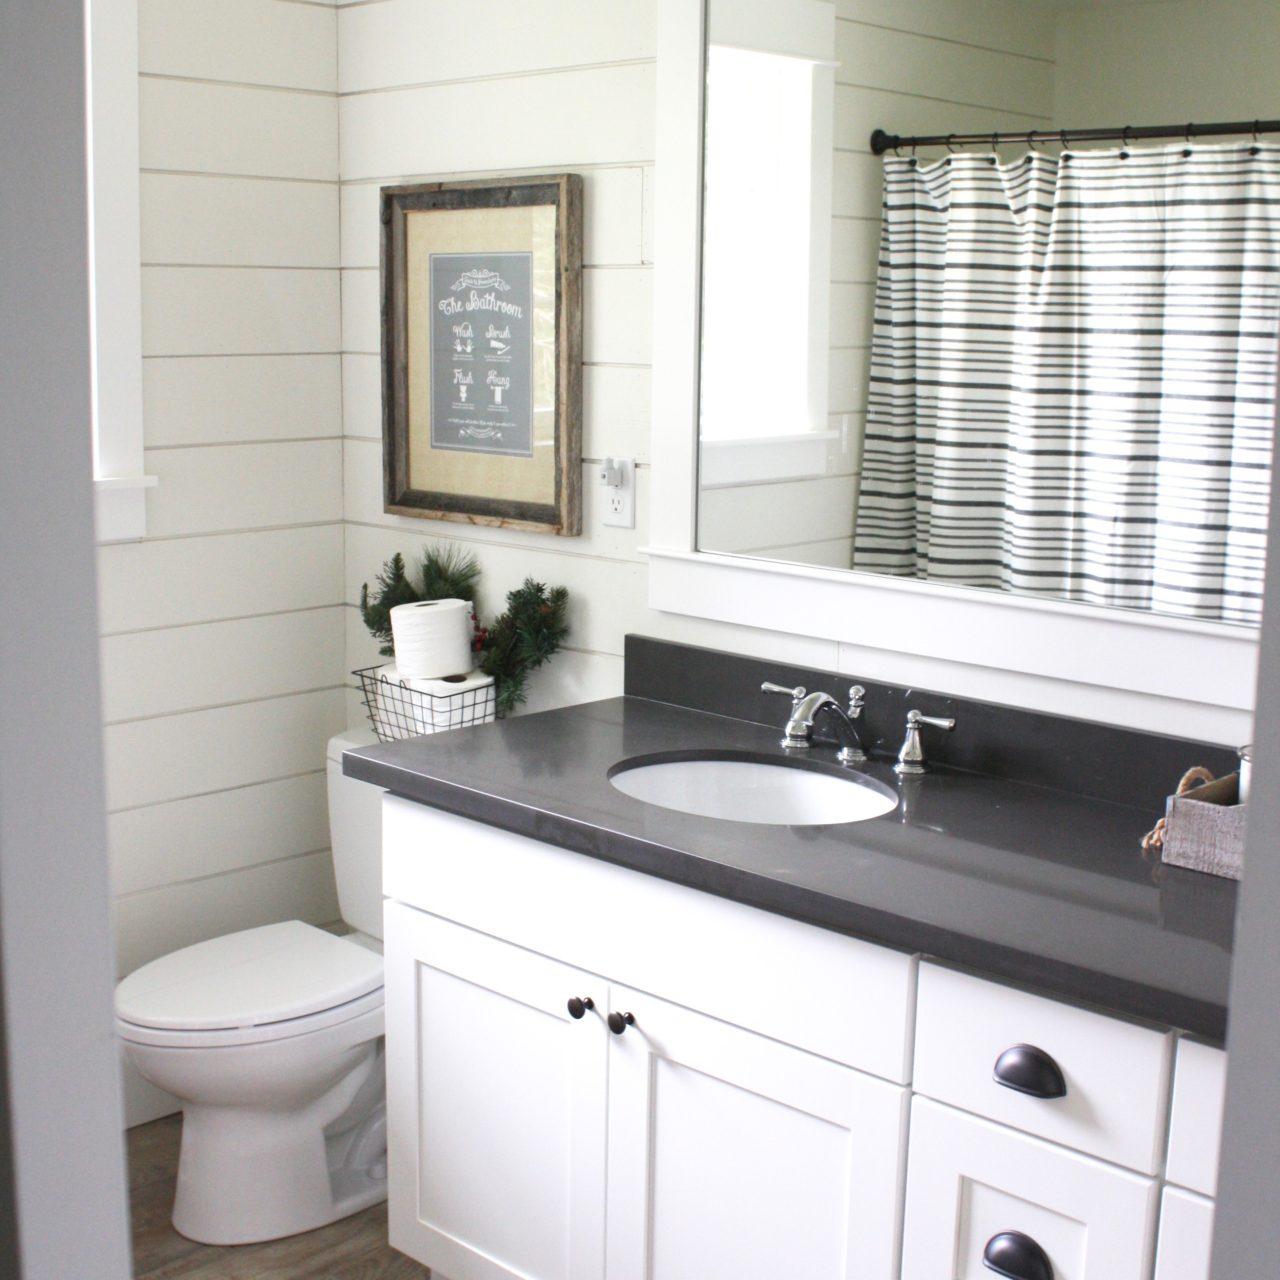 Suburban Farmhouse Interior Bathroom Remodel